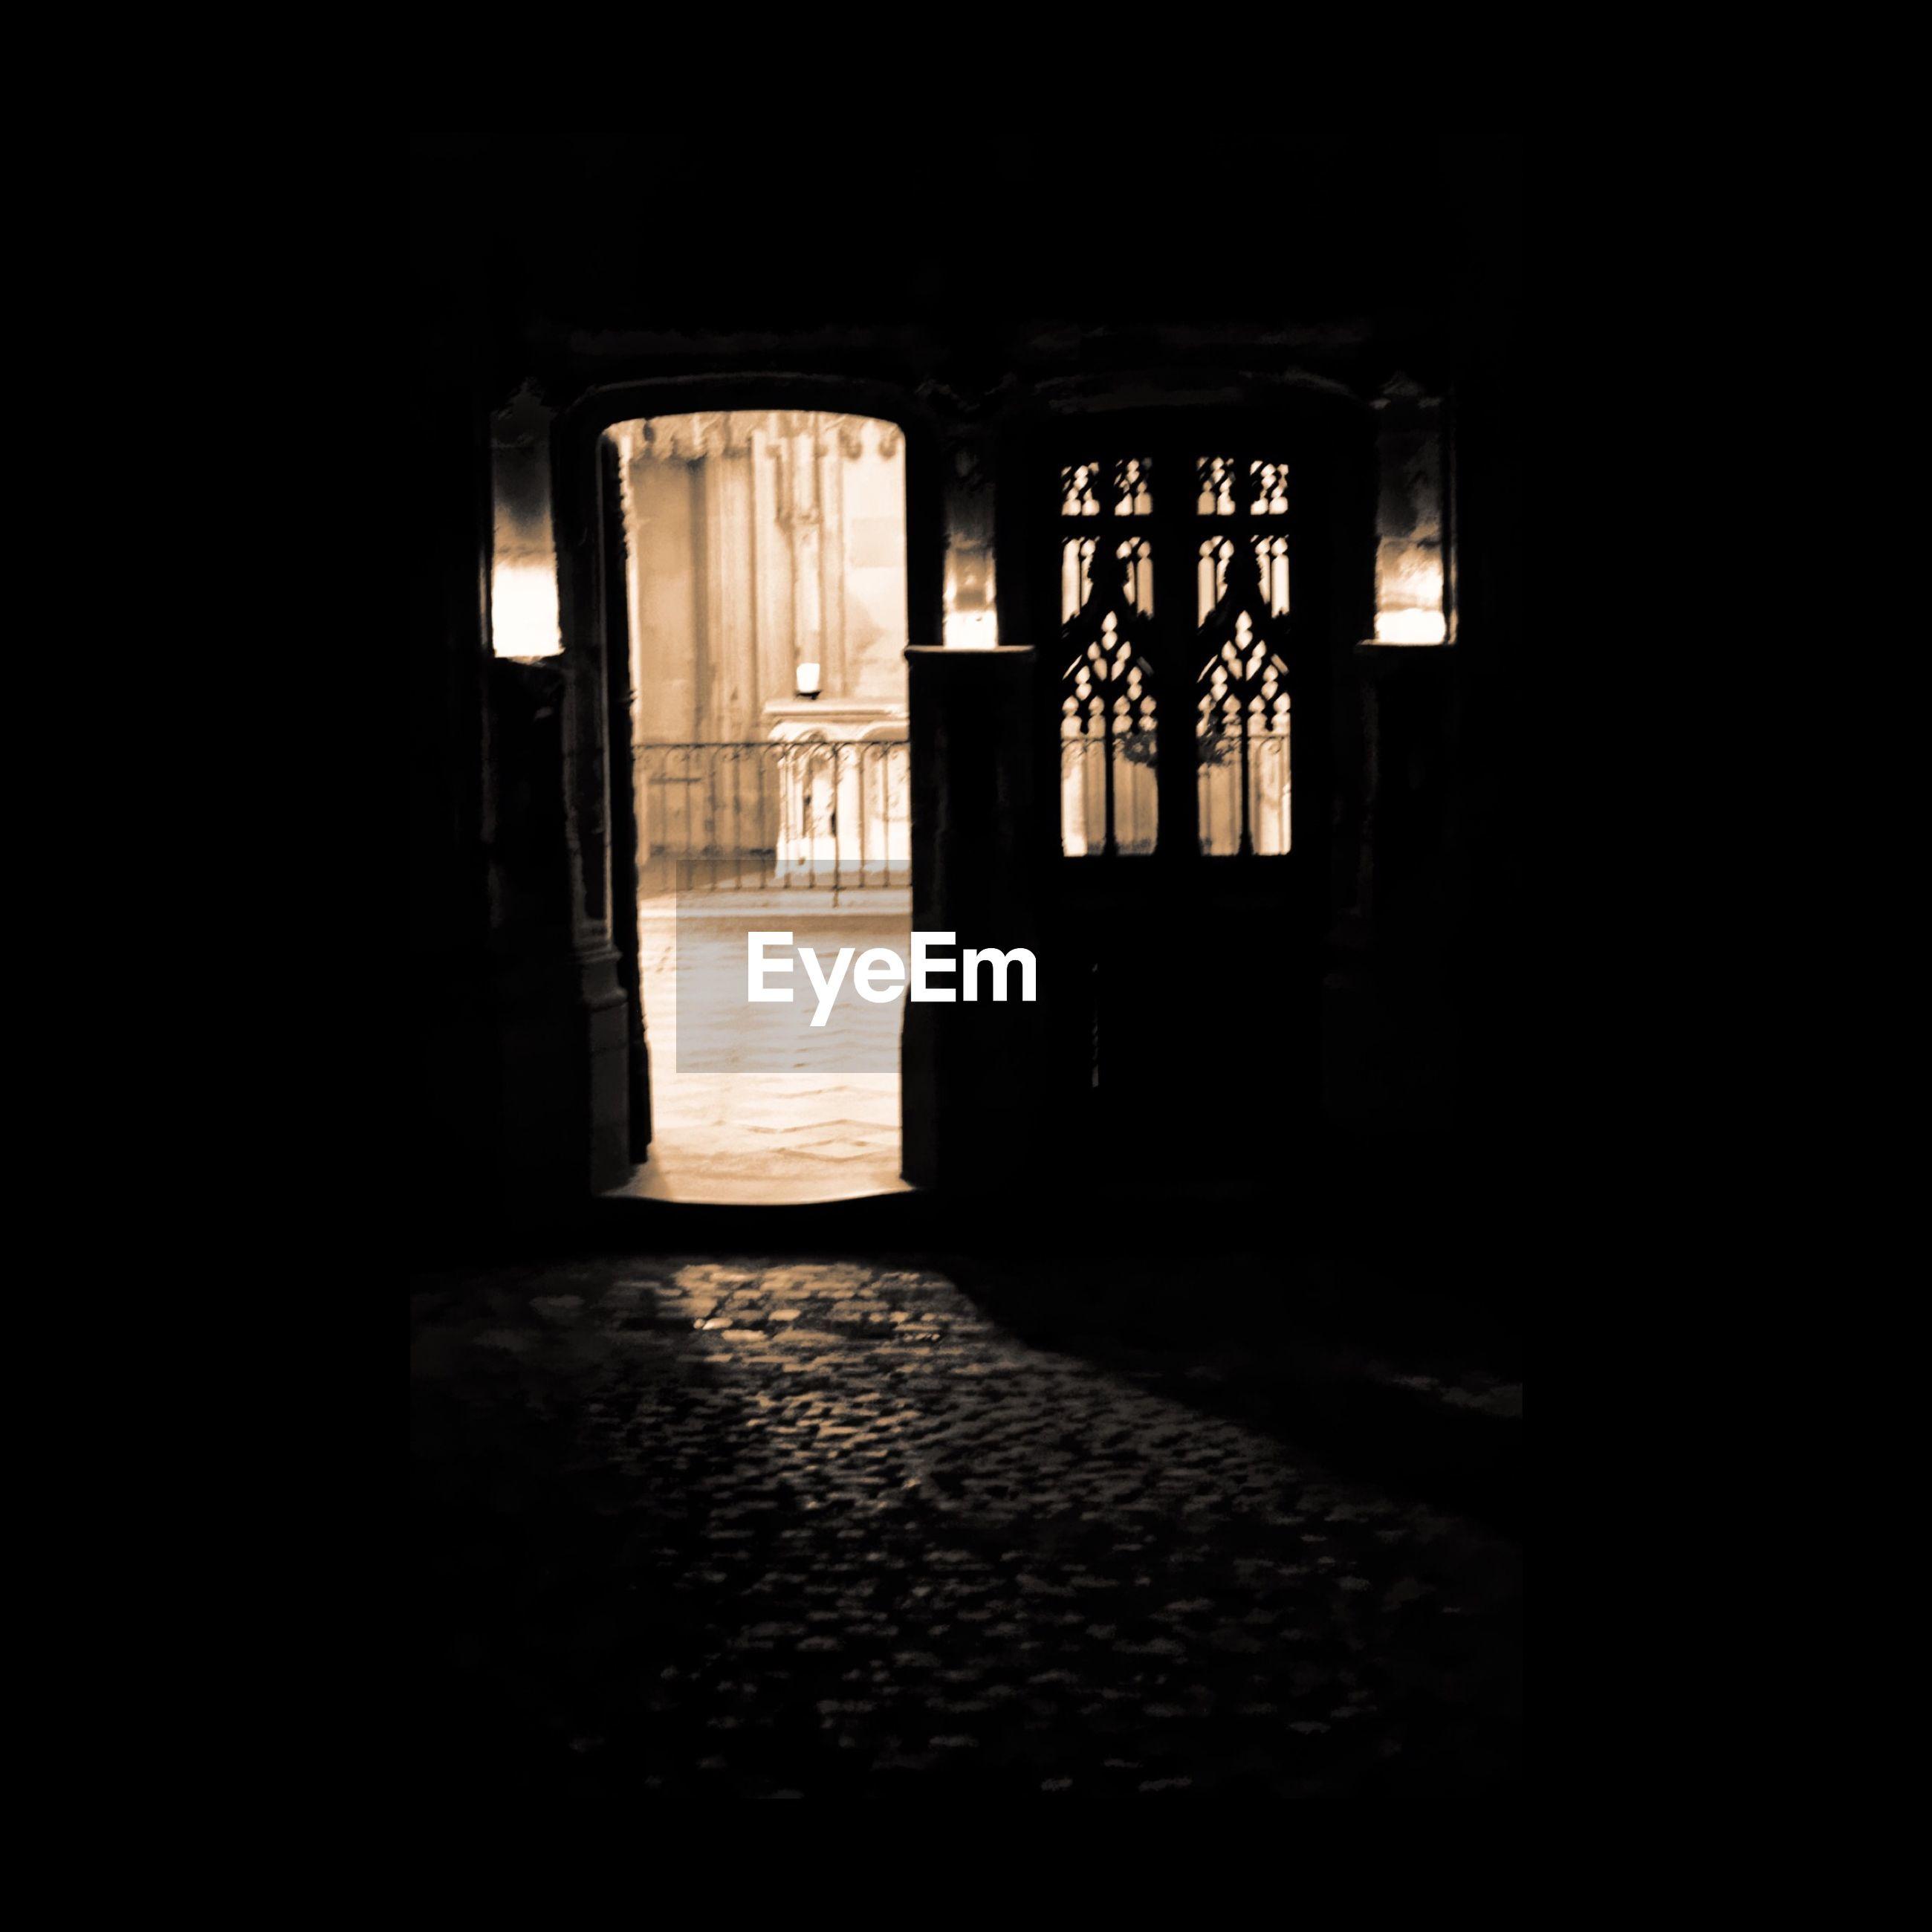 indoors, window, architecture, built structure, dark, door, house, entrance, doorway, empty, abandoned, illuminated, room, old, interior, absence, open, home interior, no people, corridor